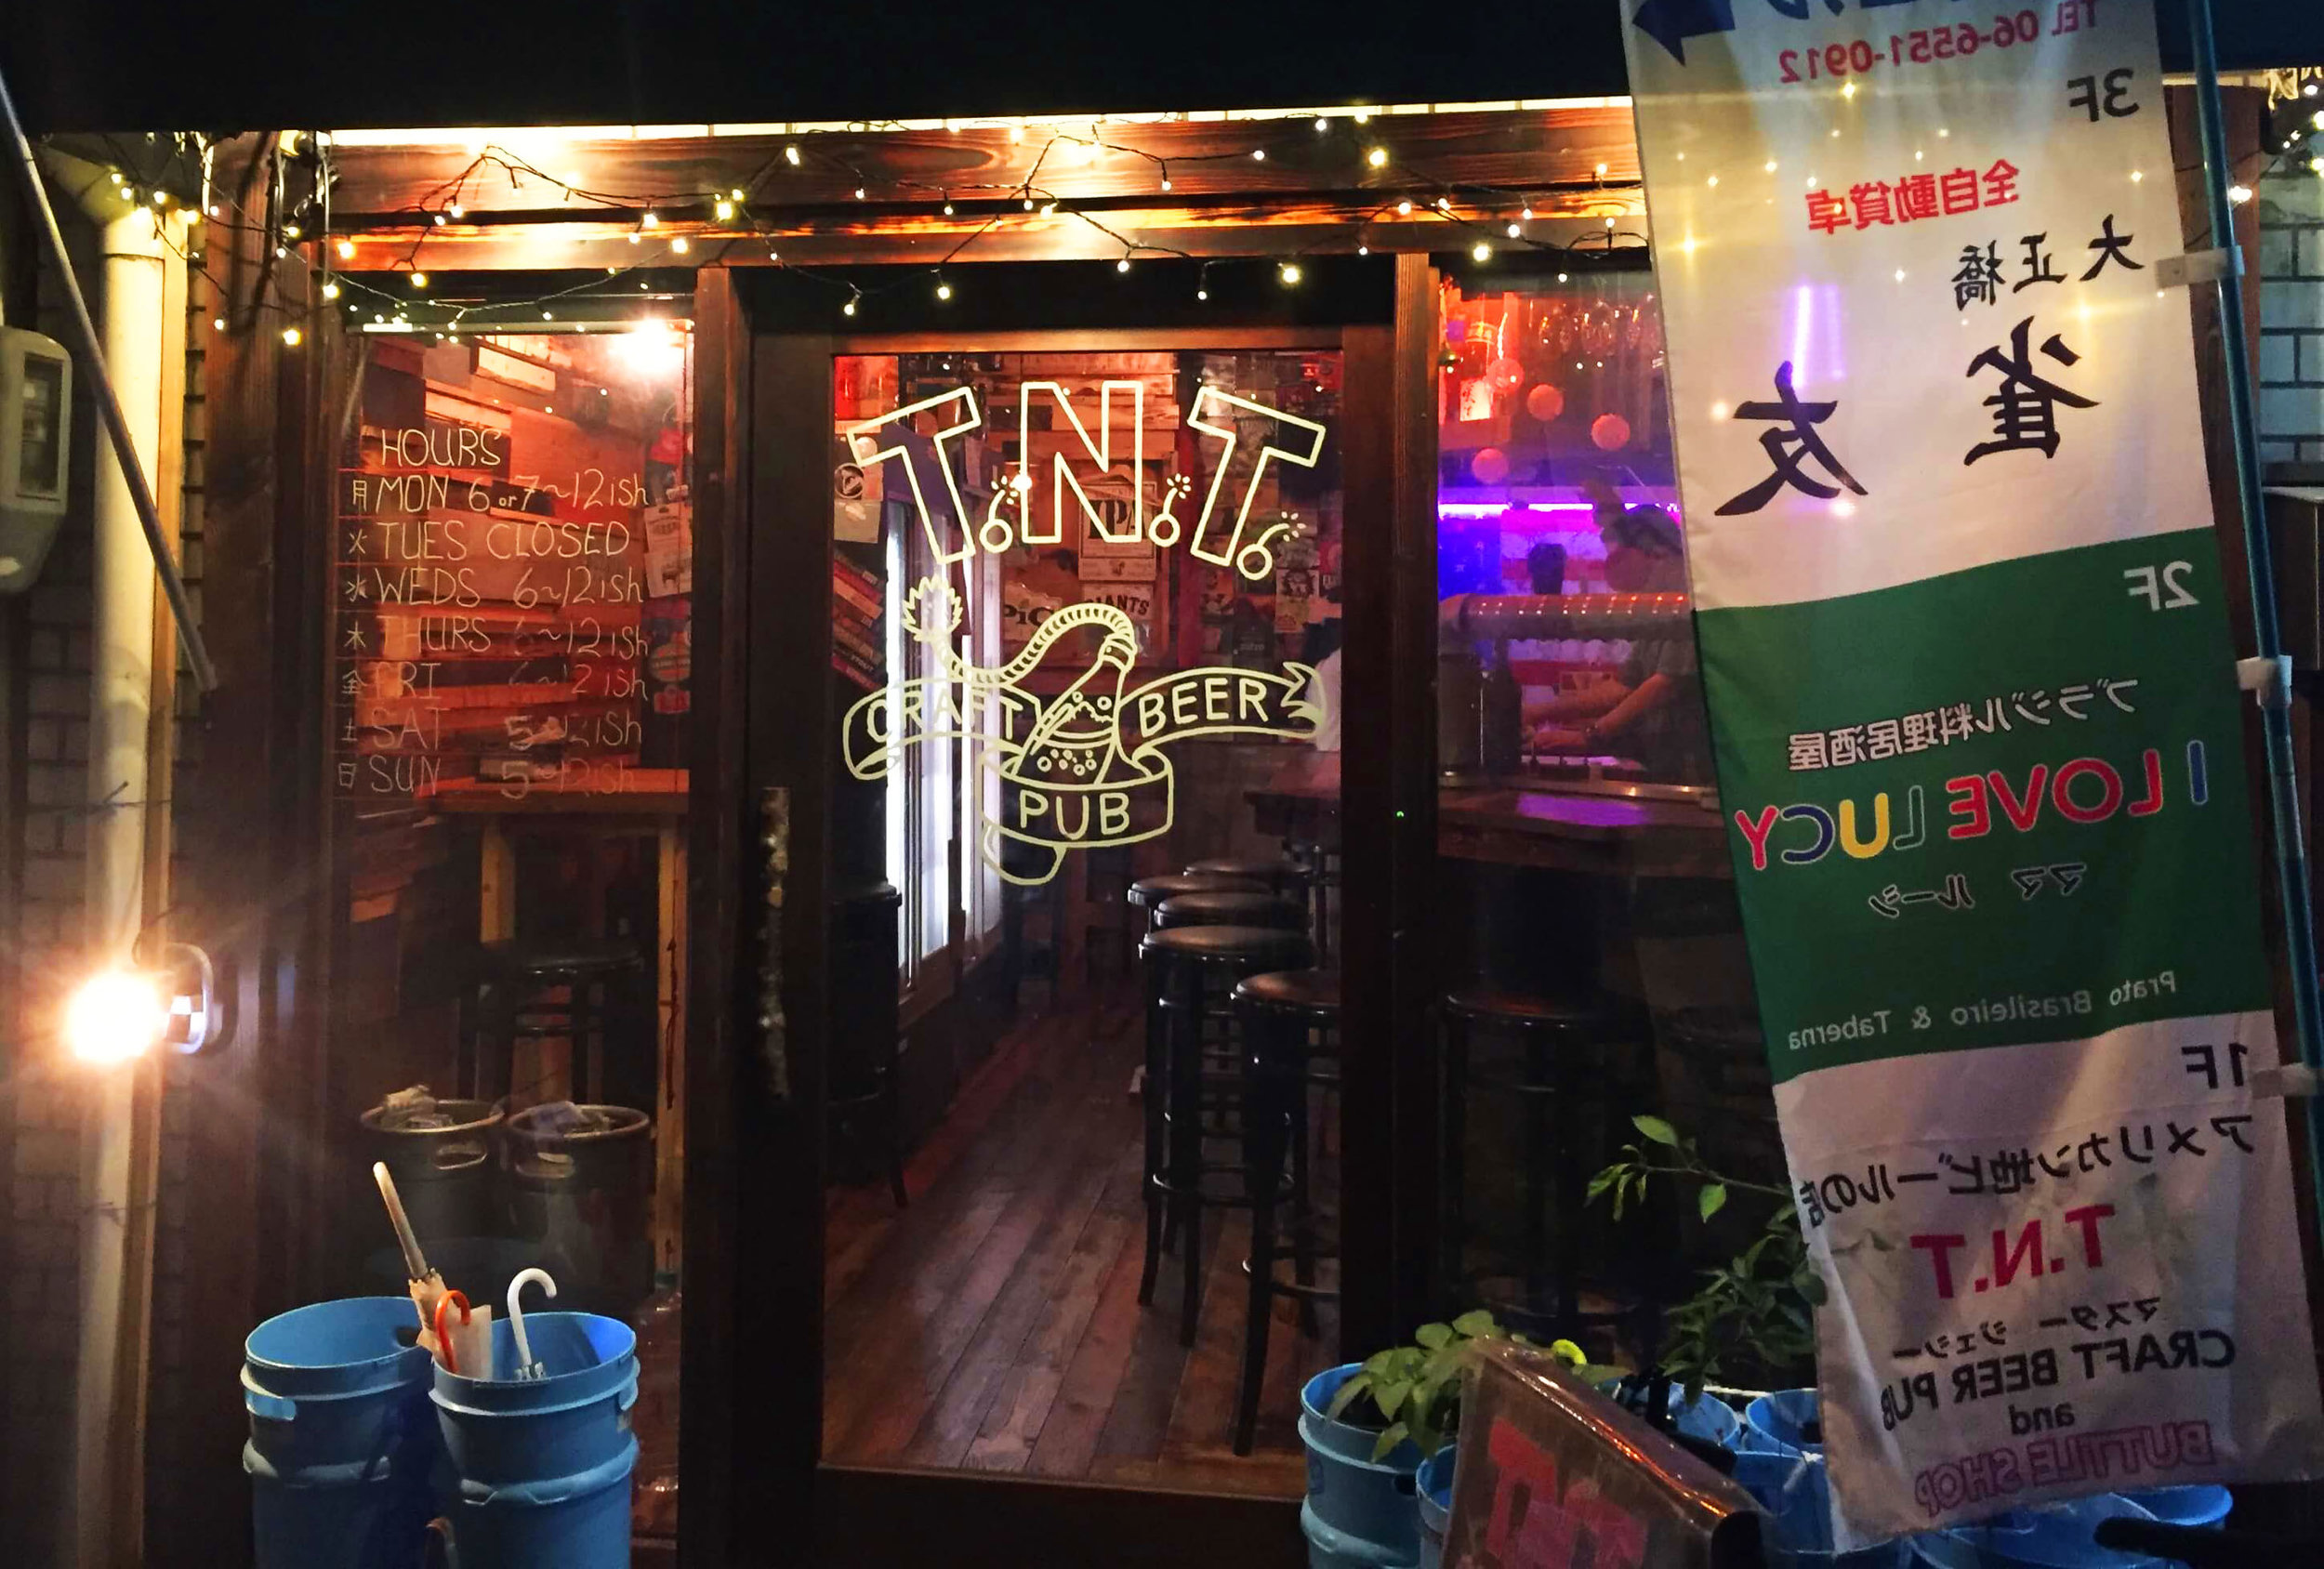 T.N.T. Craft Beer Bar in Osaka